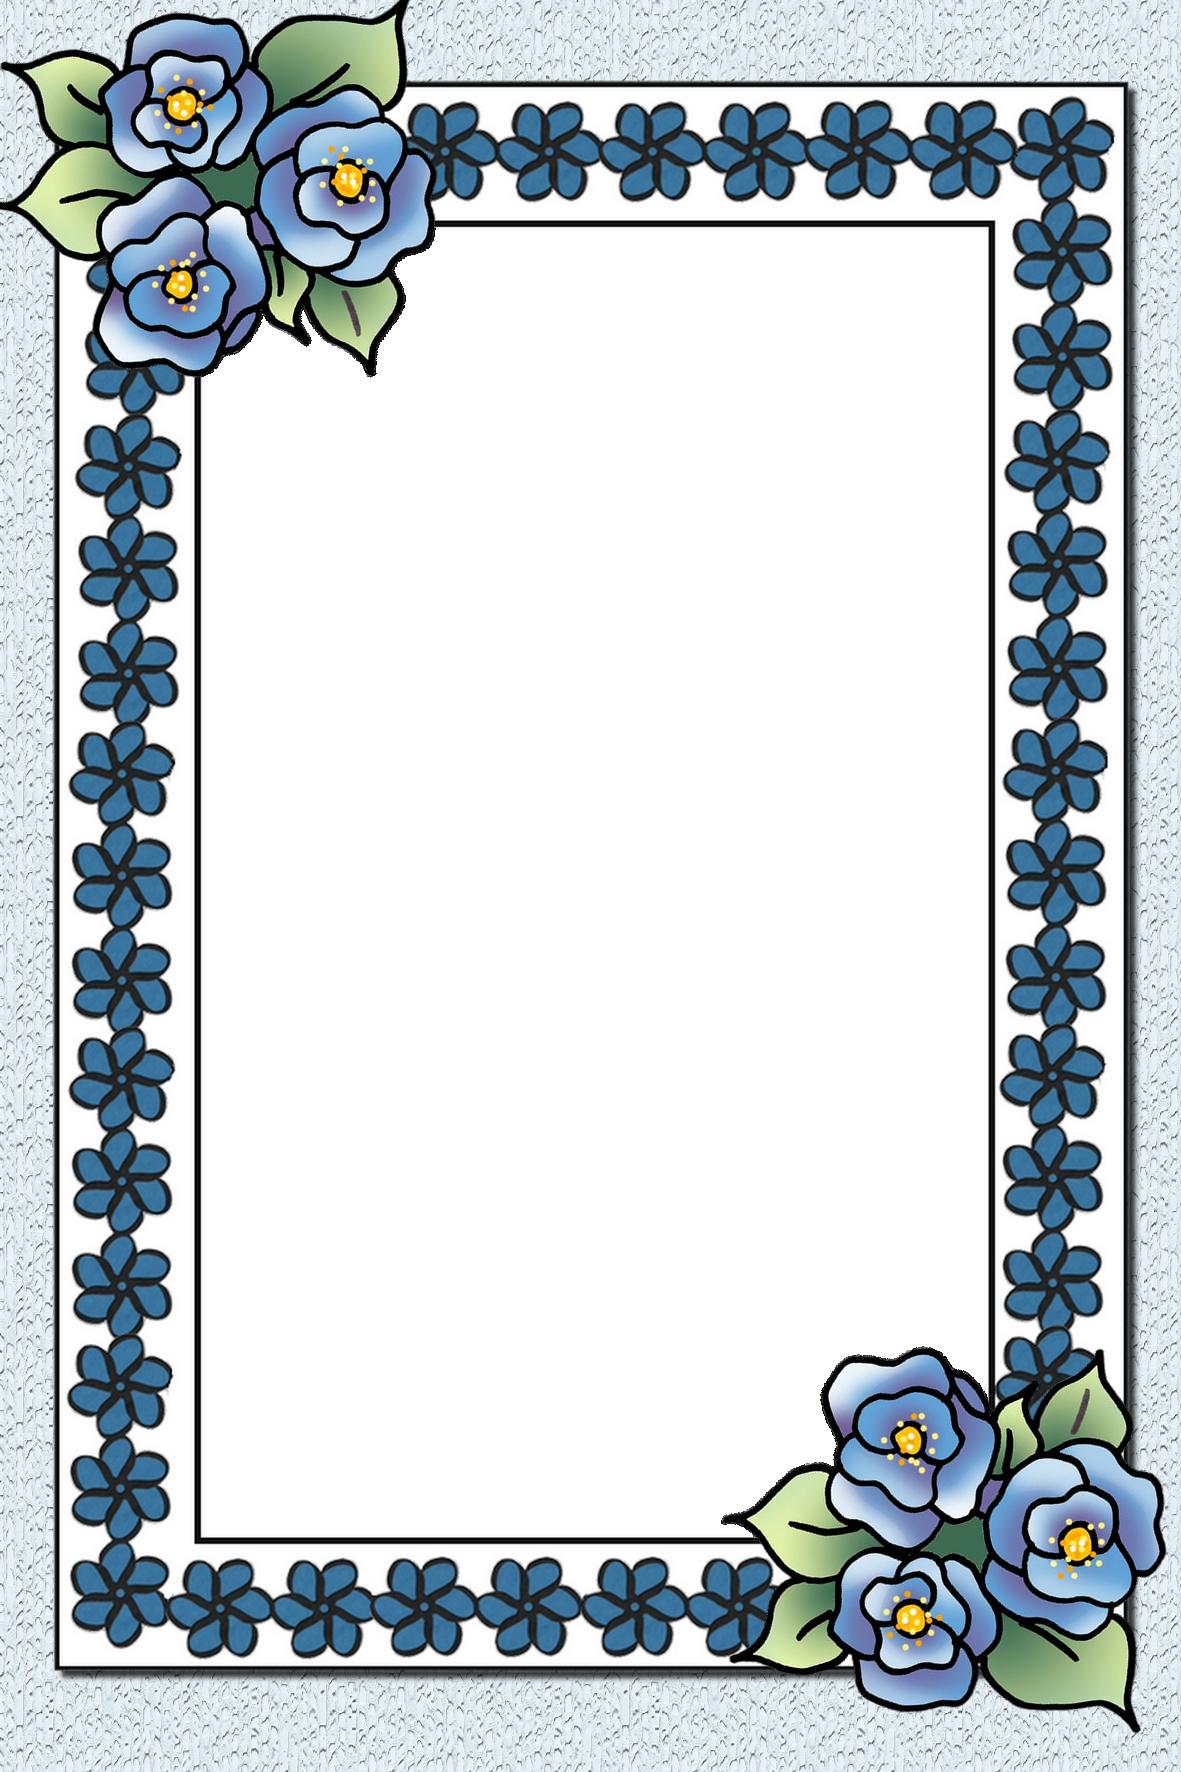 Decorative Png Frame Page Borders Design Clip Art Borders Page Decoration